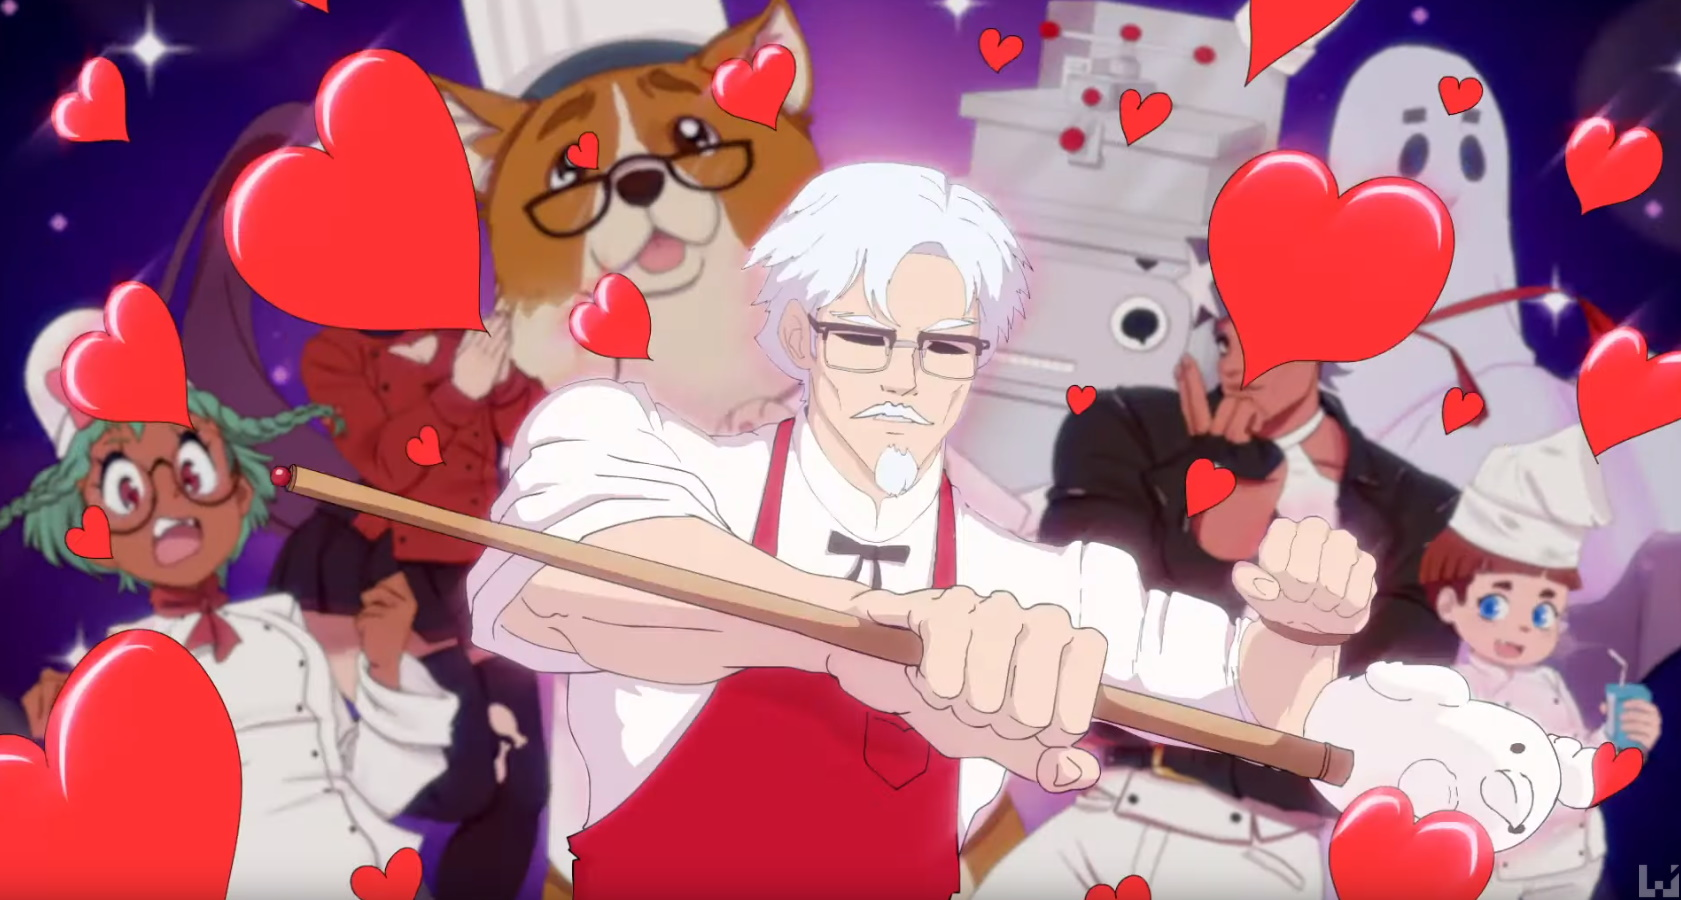 weird KFC dating simulator game ss-02